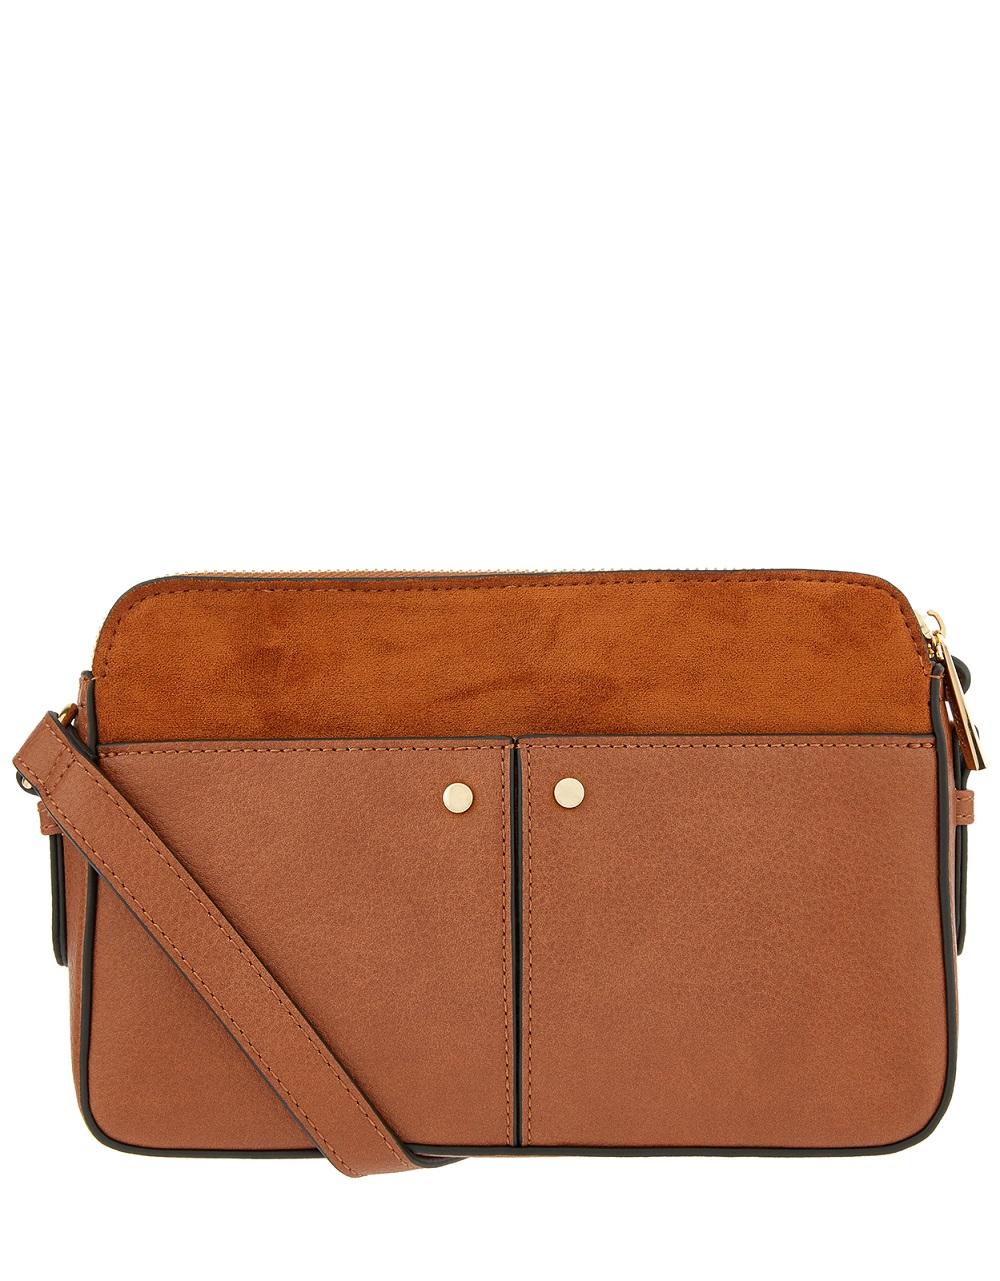 Charlotte Tan Crossbody Bag £25 Accessorize